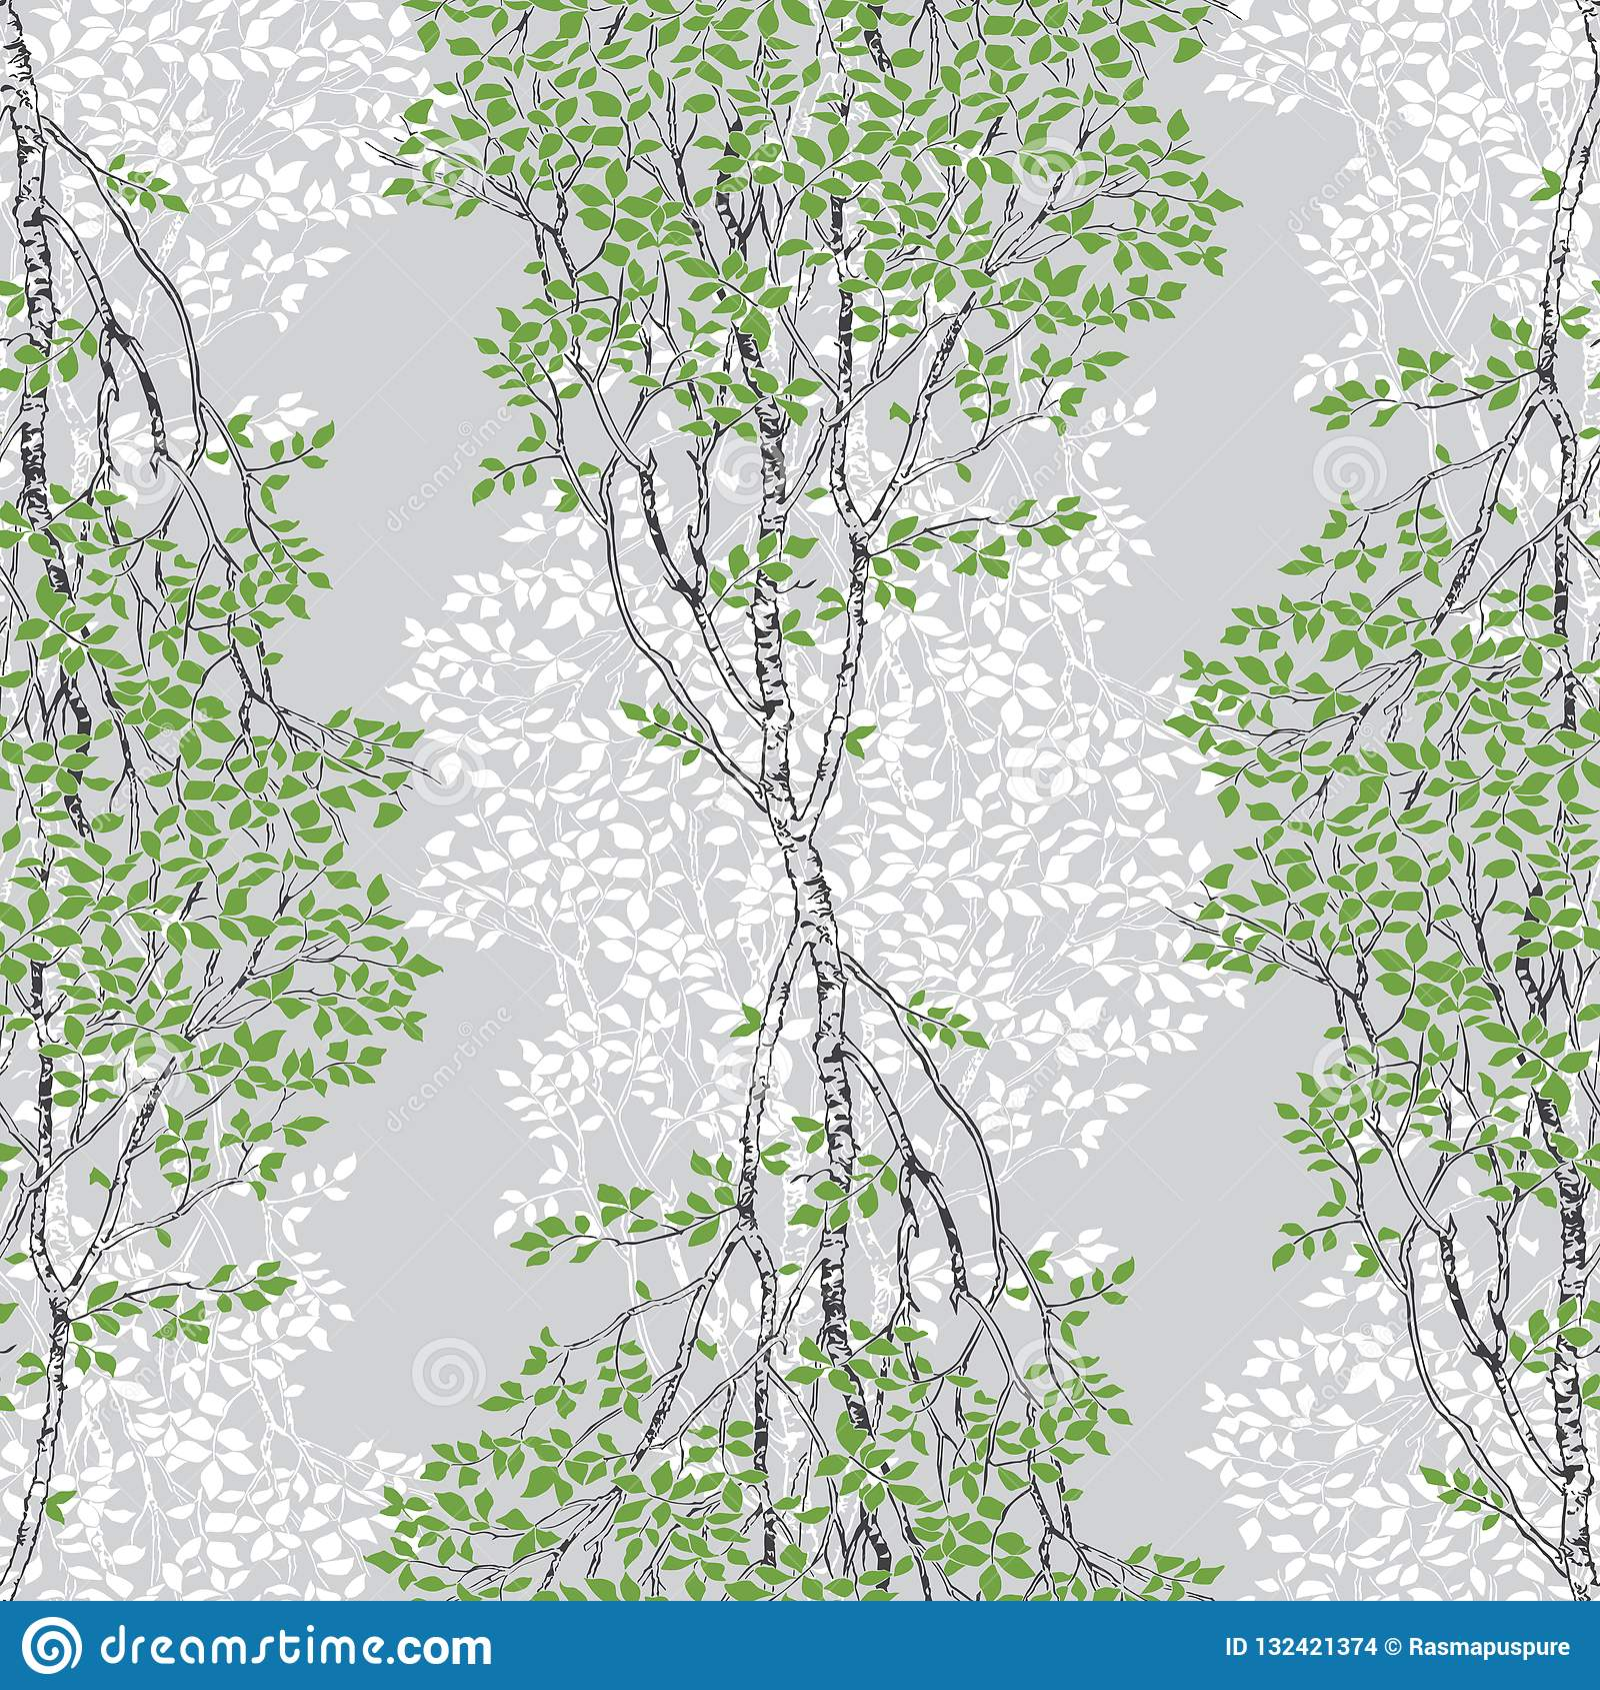 Green Birch Trees Decorative Drawing Seamless Pattern